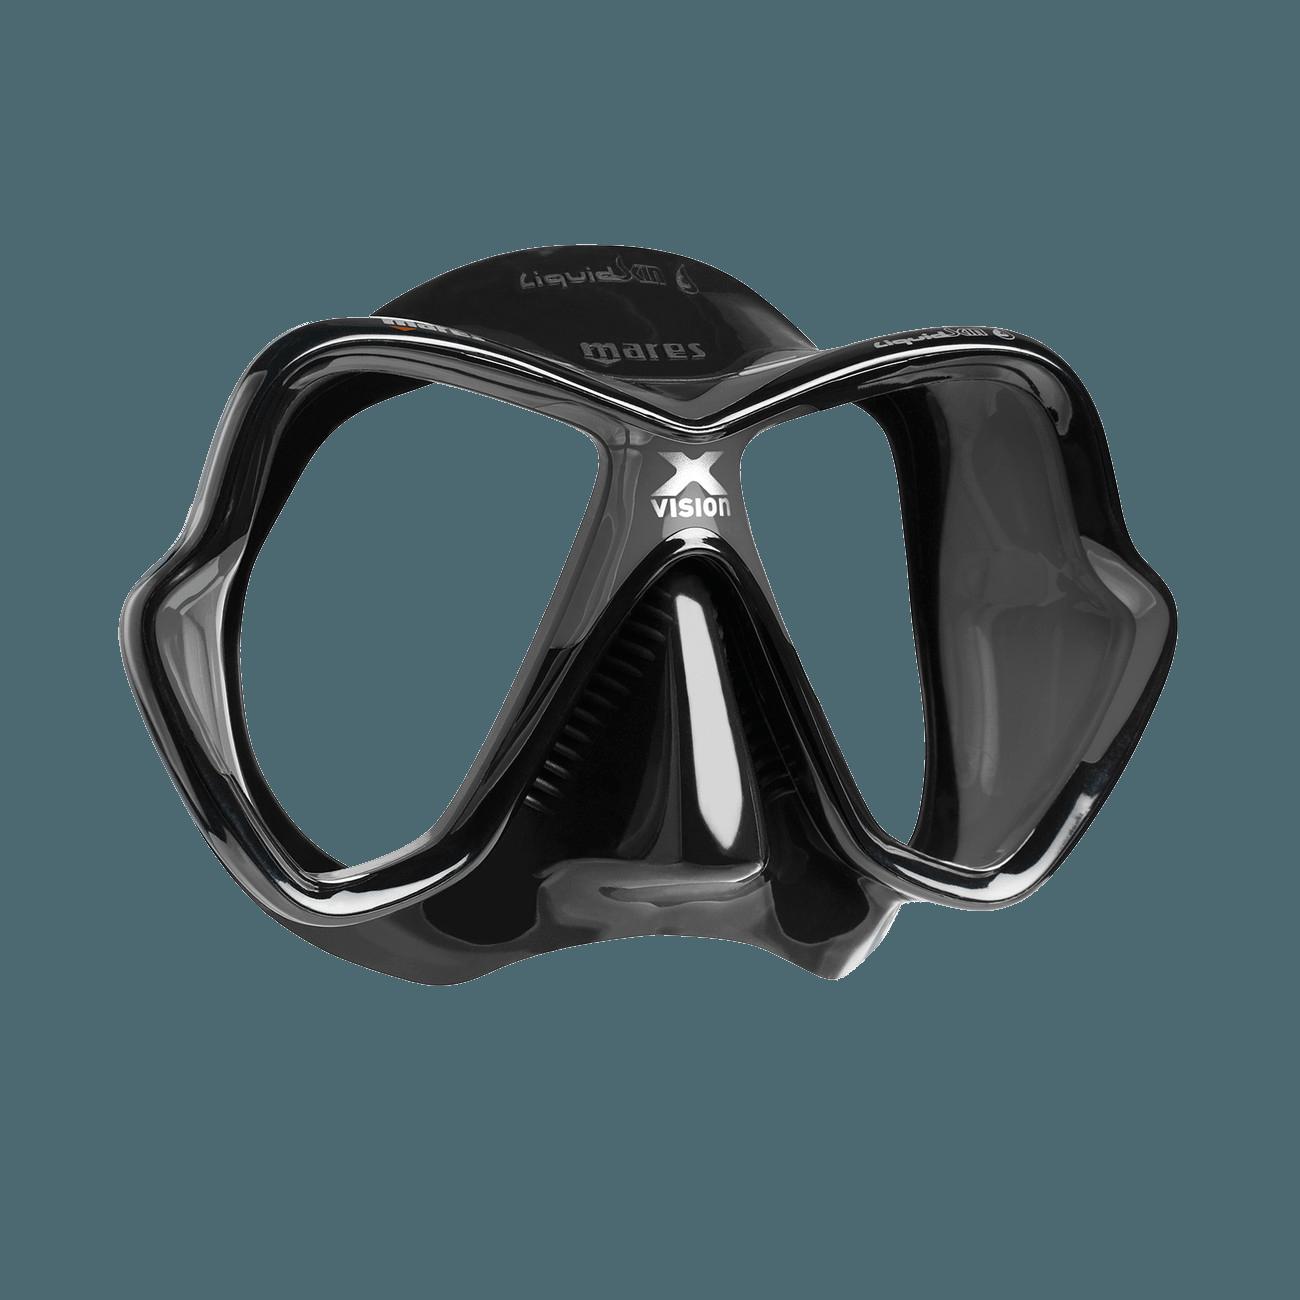 Mares X Vision Ultra Liquidskin Mask | Mares Dive Mask | Gill Divers